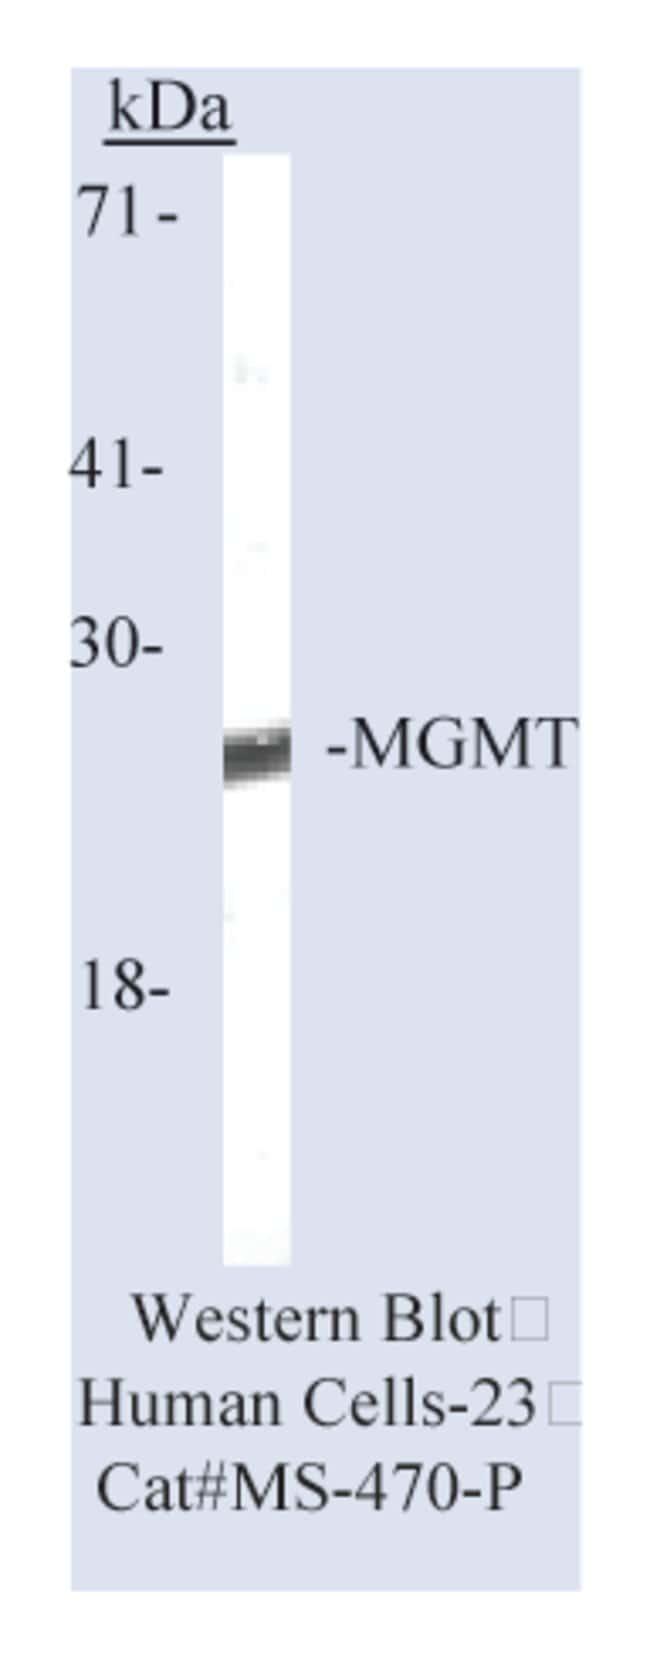 Thermo Scientific Lab Vision MGMT (O-methylguanine-DNA methyltransferase)